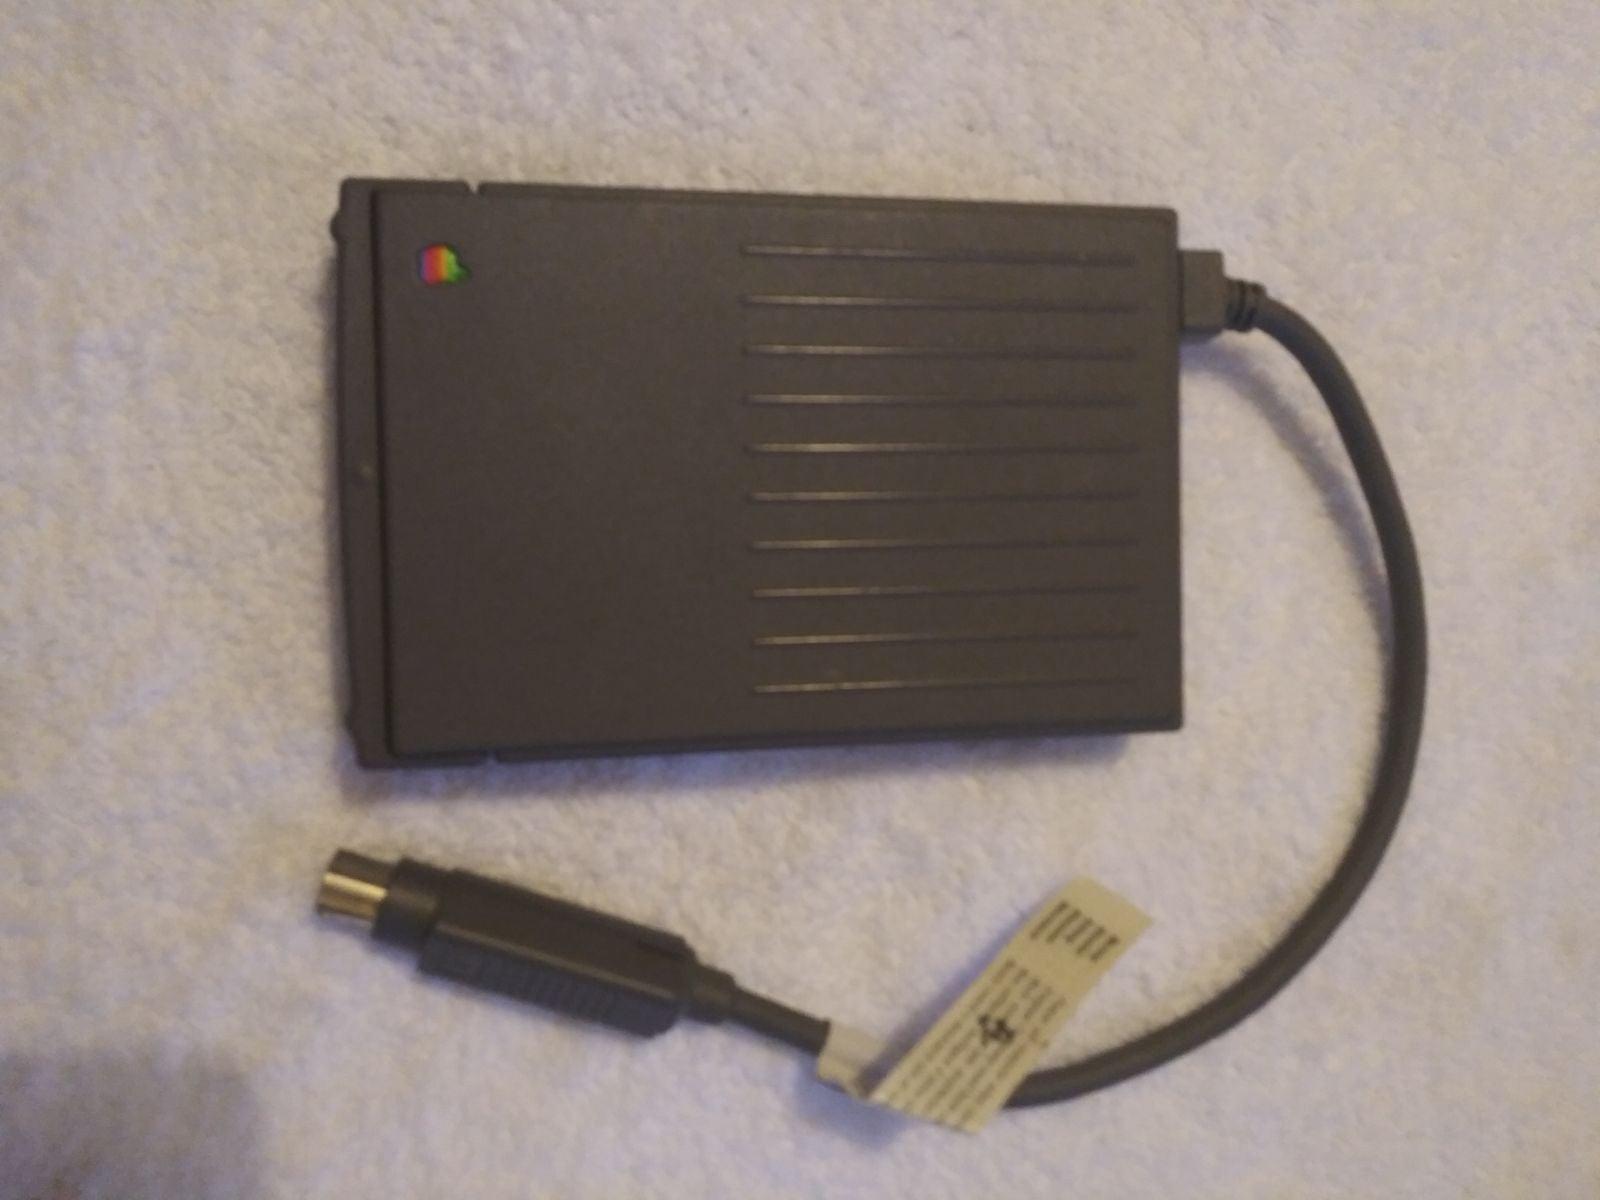 Apple Macintosh HDI-20 External 1.4MB